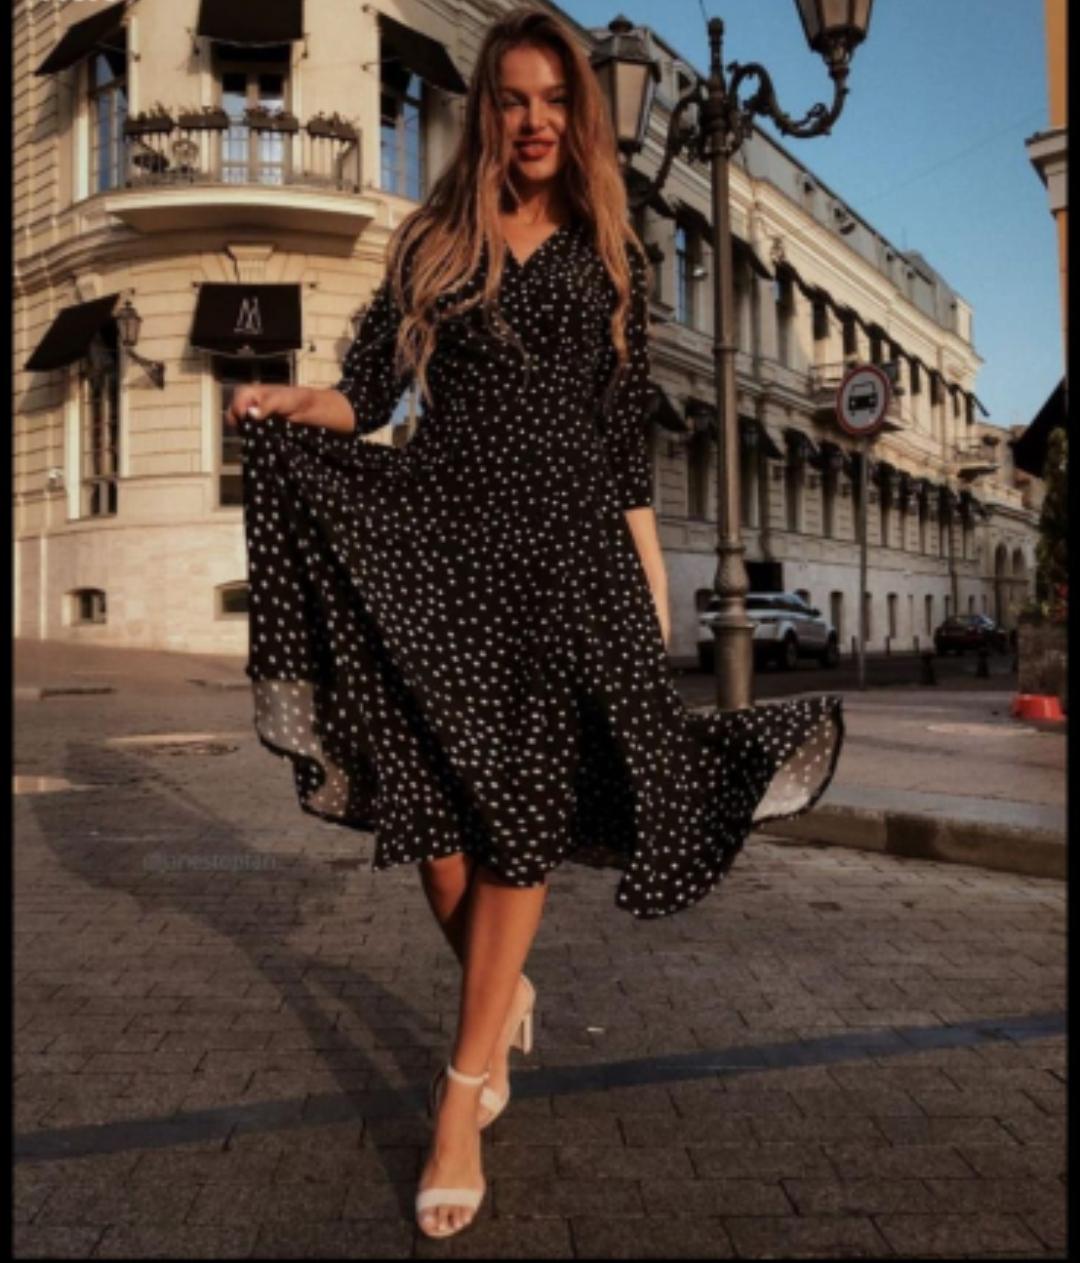 KELLY BLACK DRESS